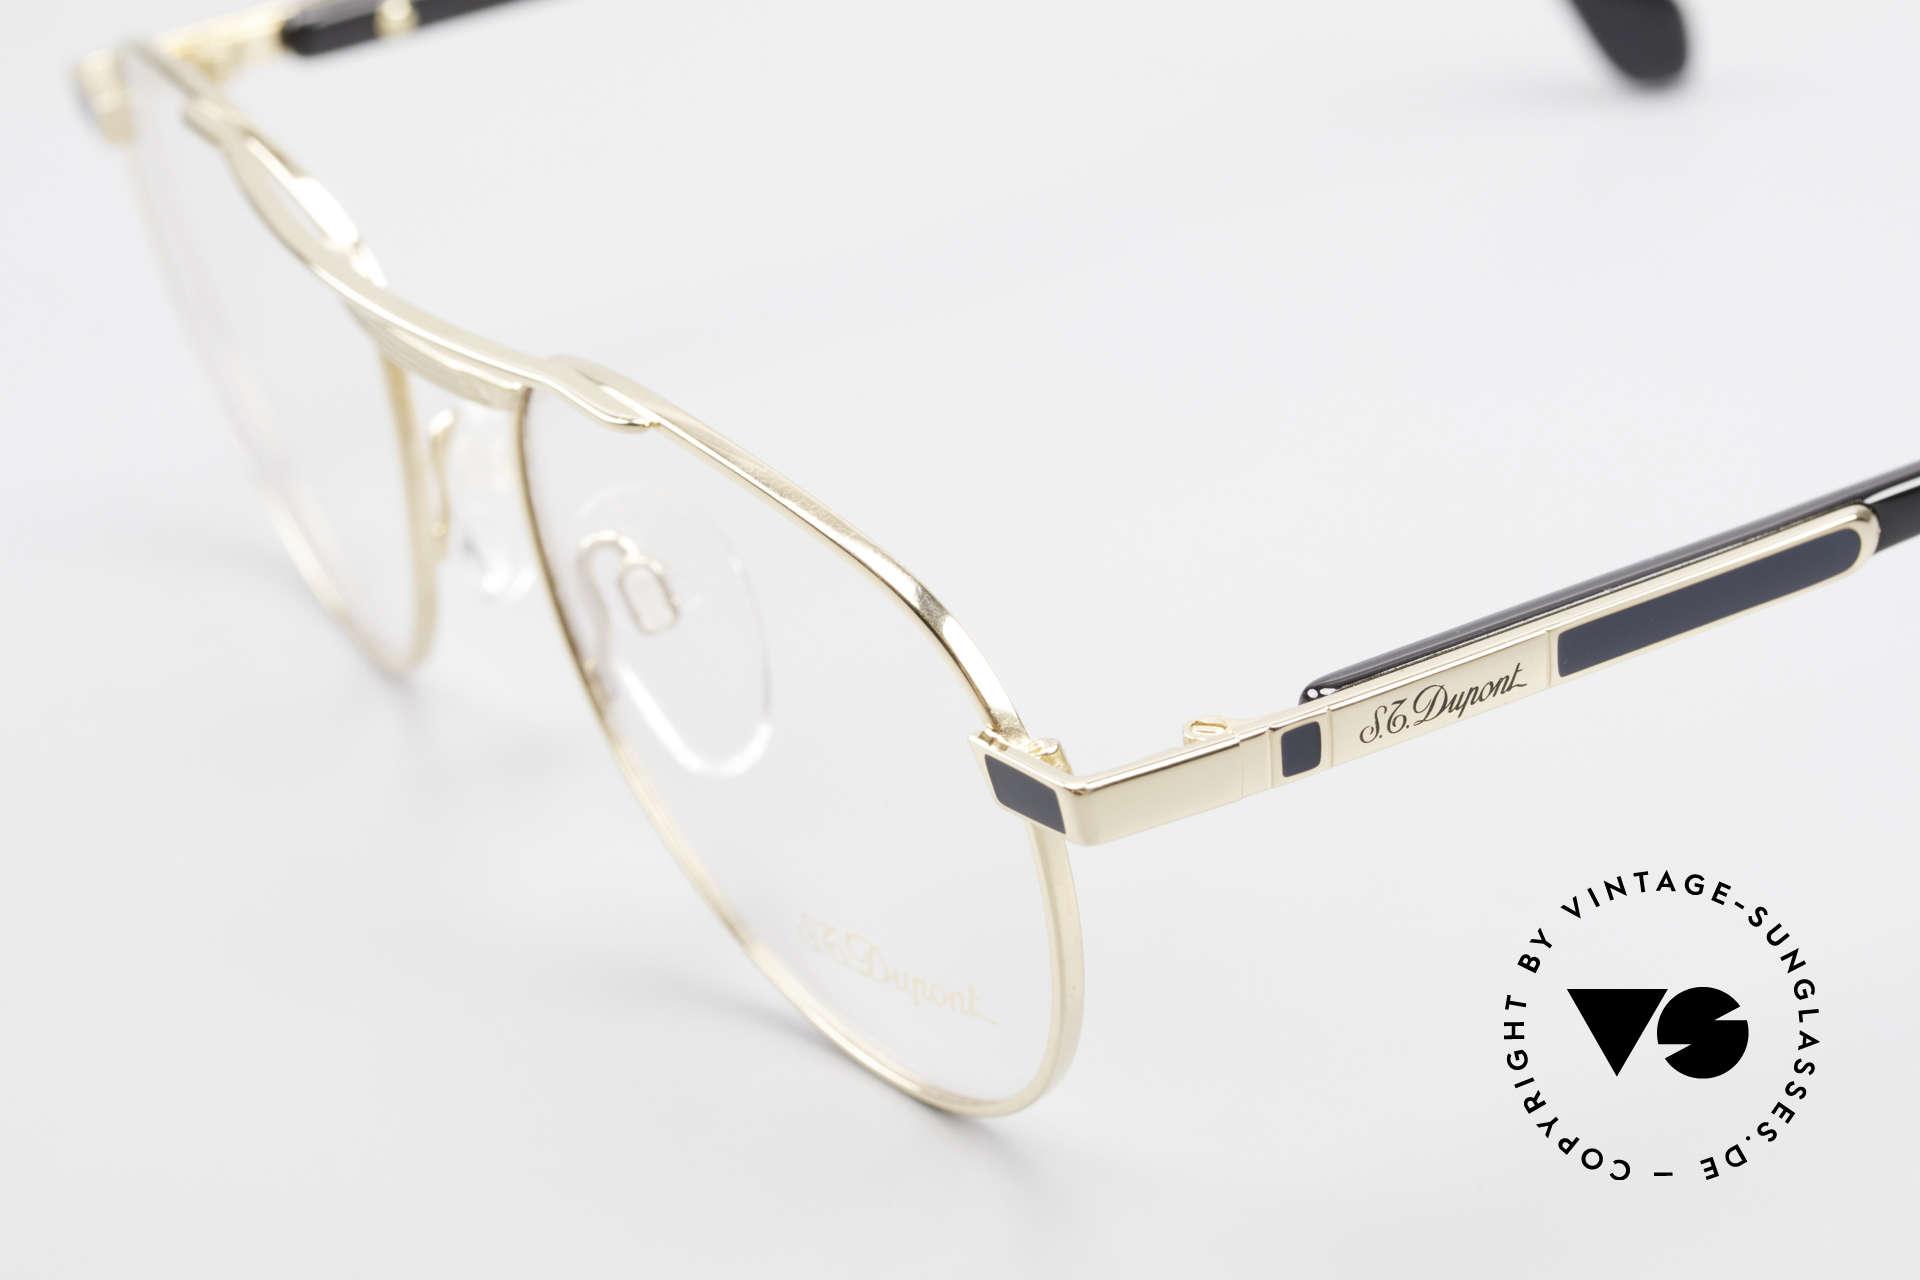 S.T. Dupont D004 Men's Luxury Aviator Glasses, incl. orig. S.T. Dupont certificate, hard case & packing, Made for Men